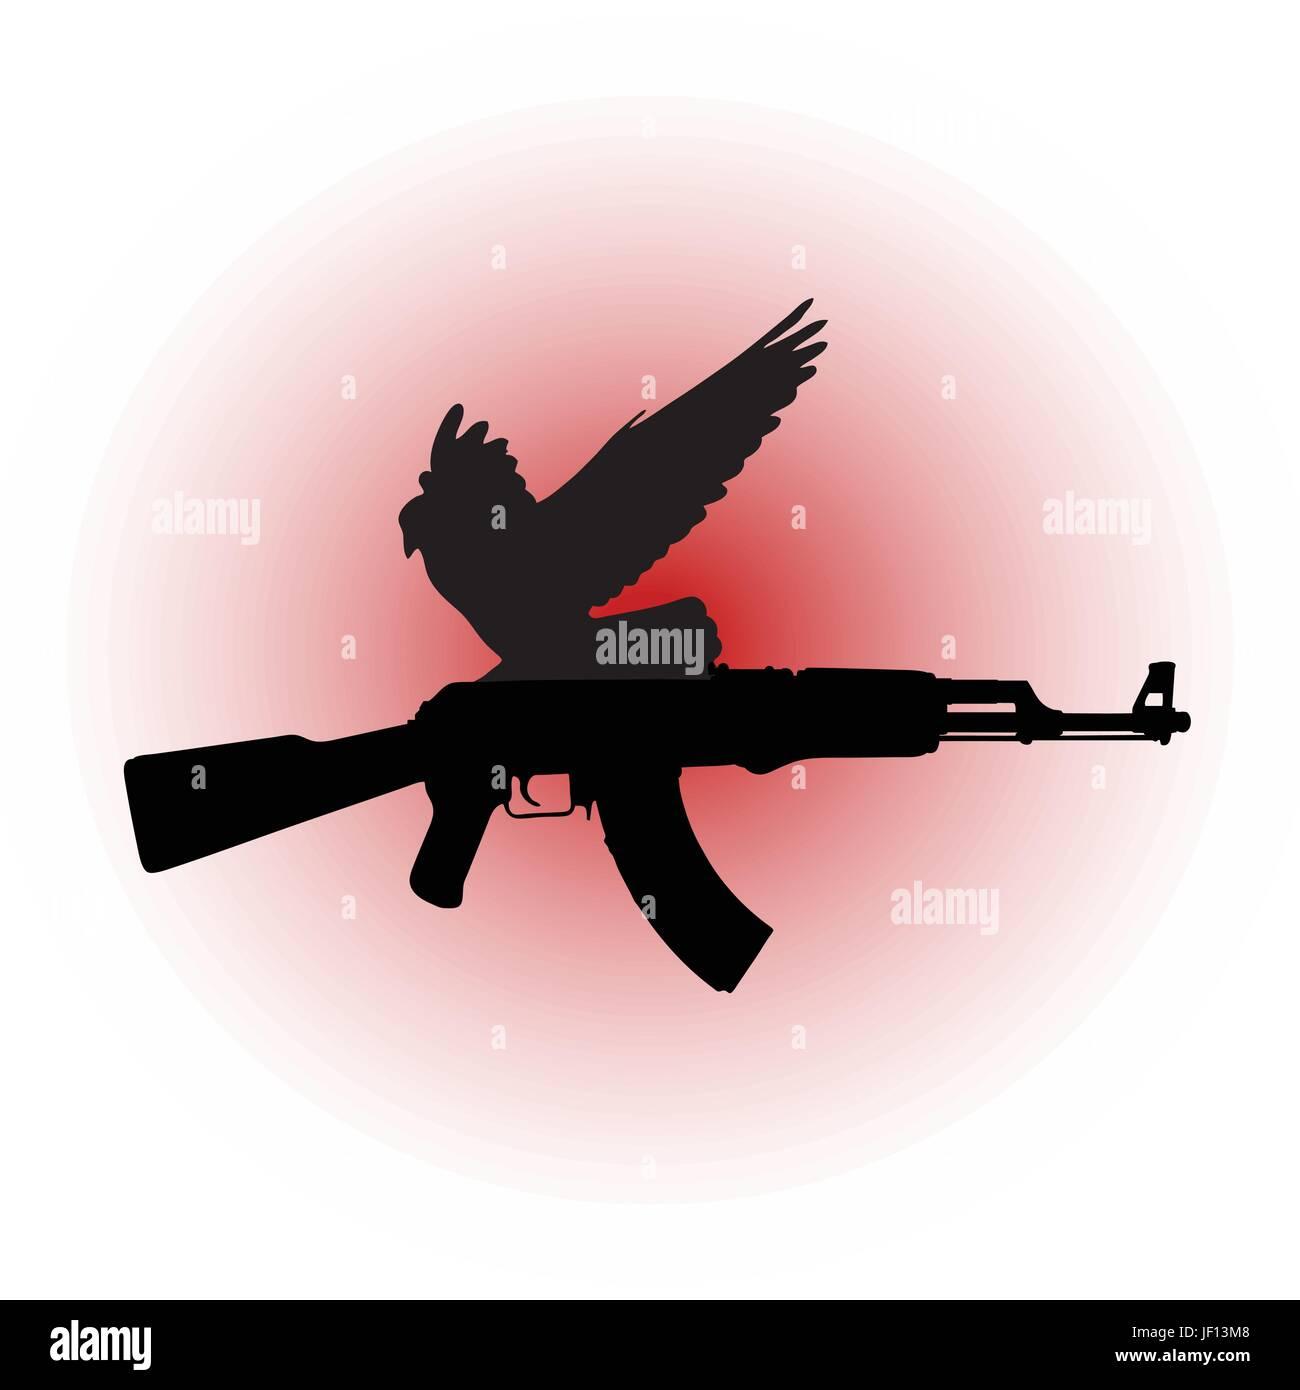 fight, fighting, bird, birds, war, pigeon, pictogram, symbol, pictograph, trade Stock Vector